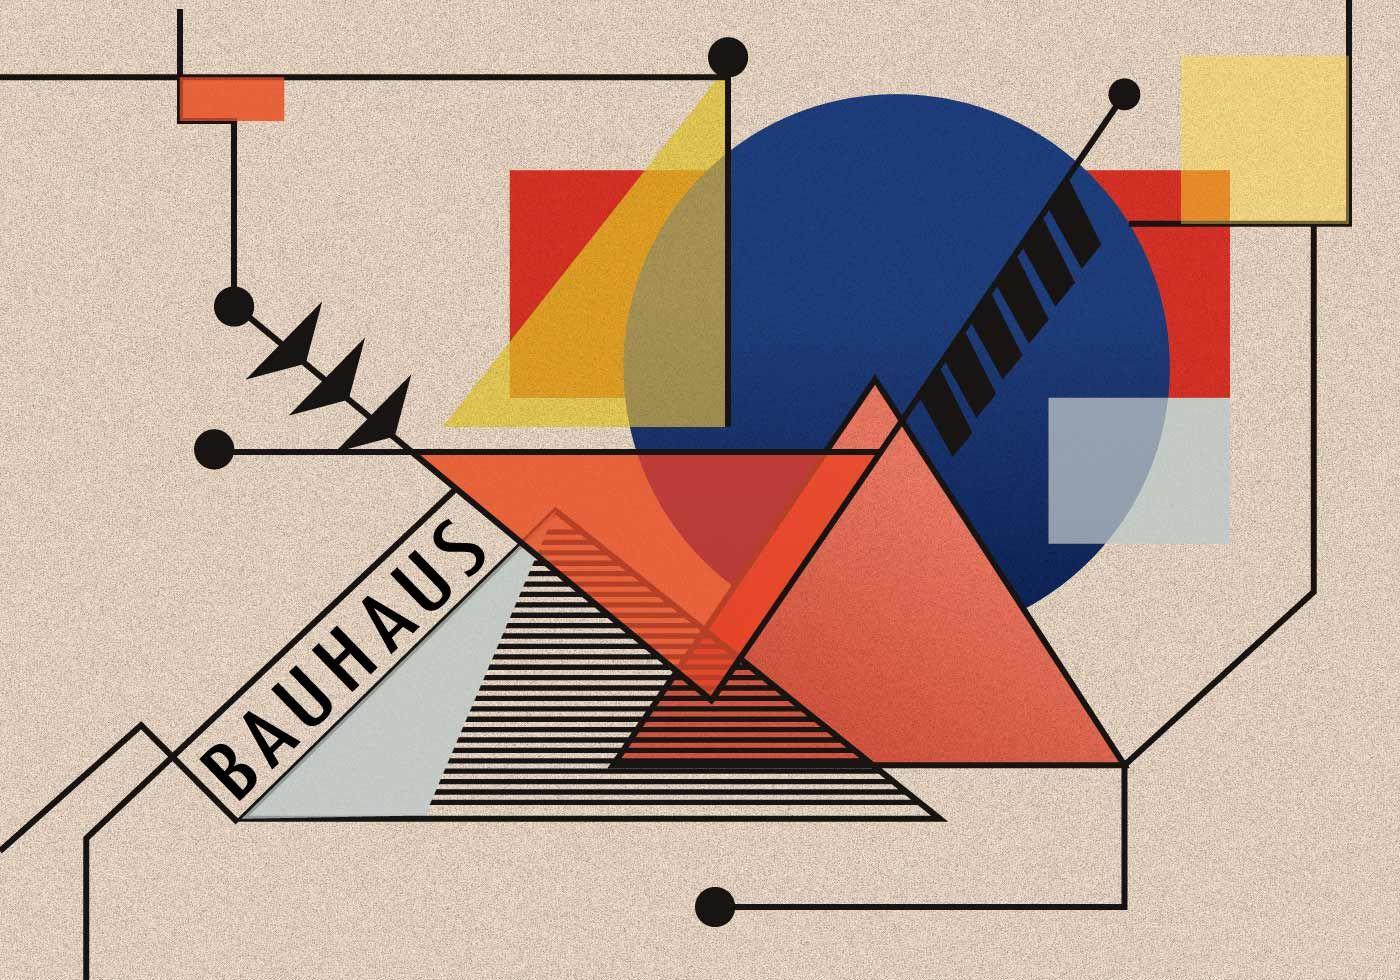 Bauhaus Pattern Free Vector Art 5288 Free Downloads With